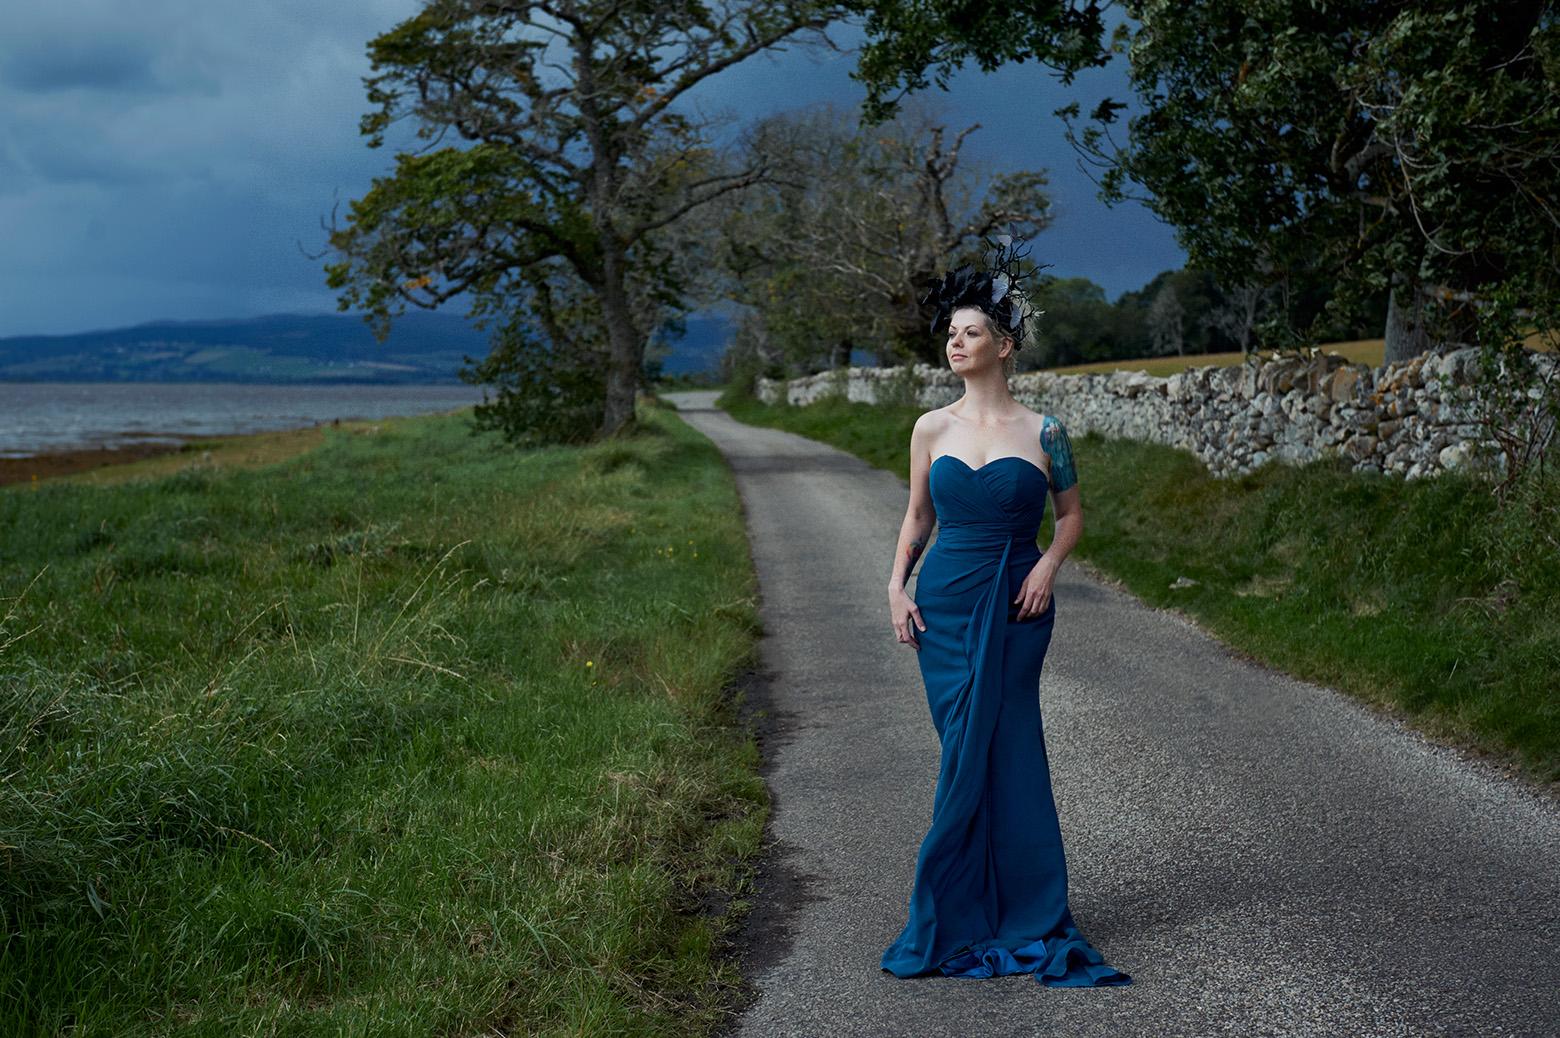 Photographin the wonderful Natalie on the Black Isle, Scotland.